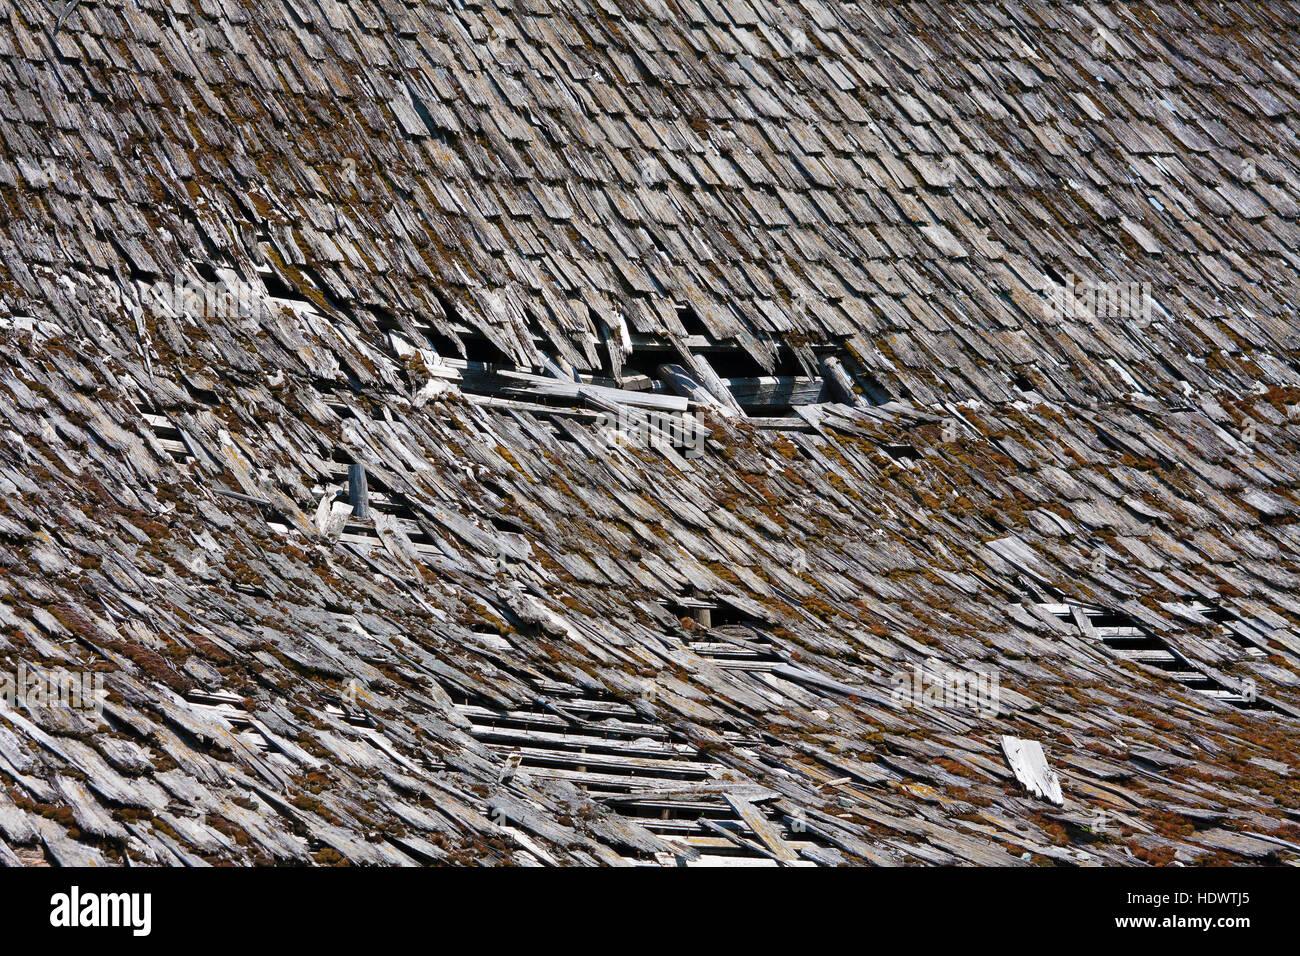 Tattered shingles on barn roof - Stock Image